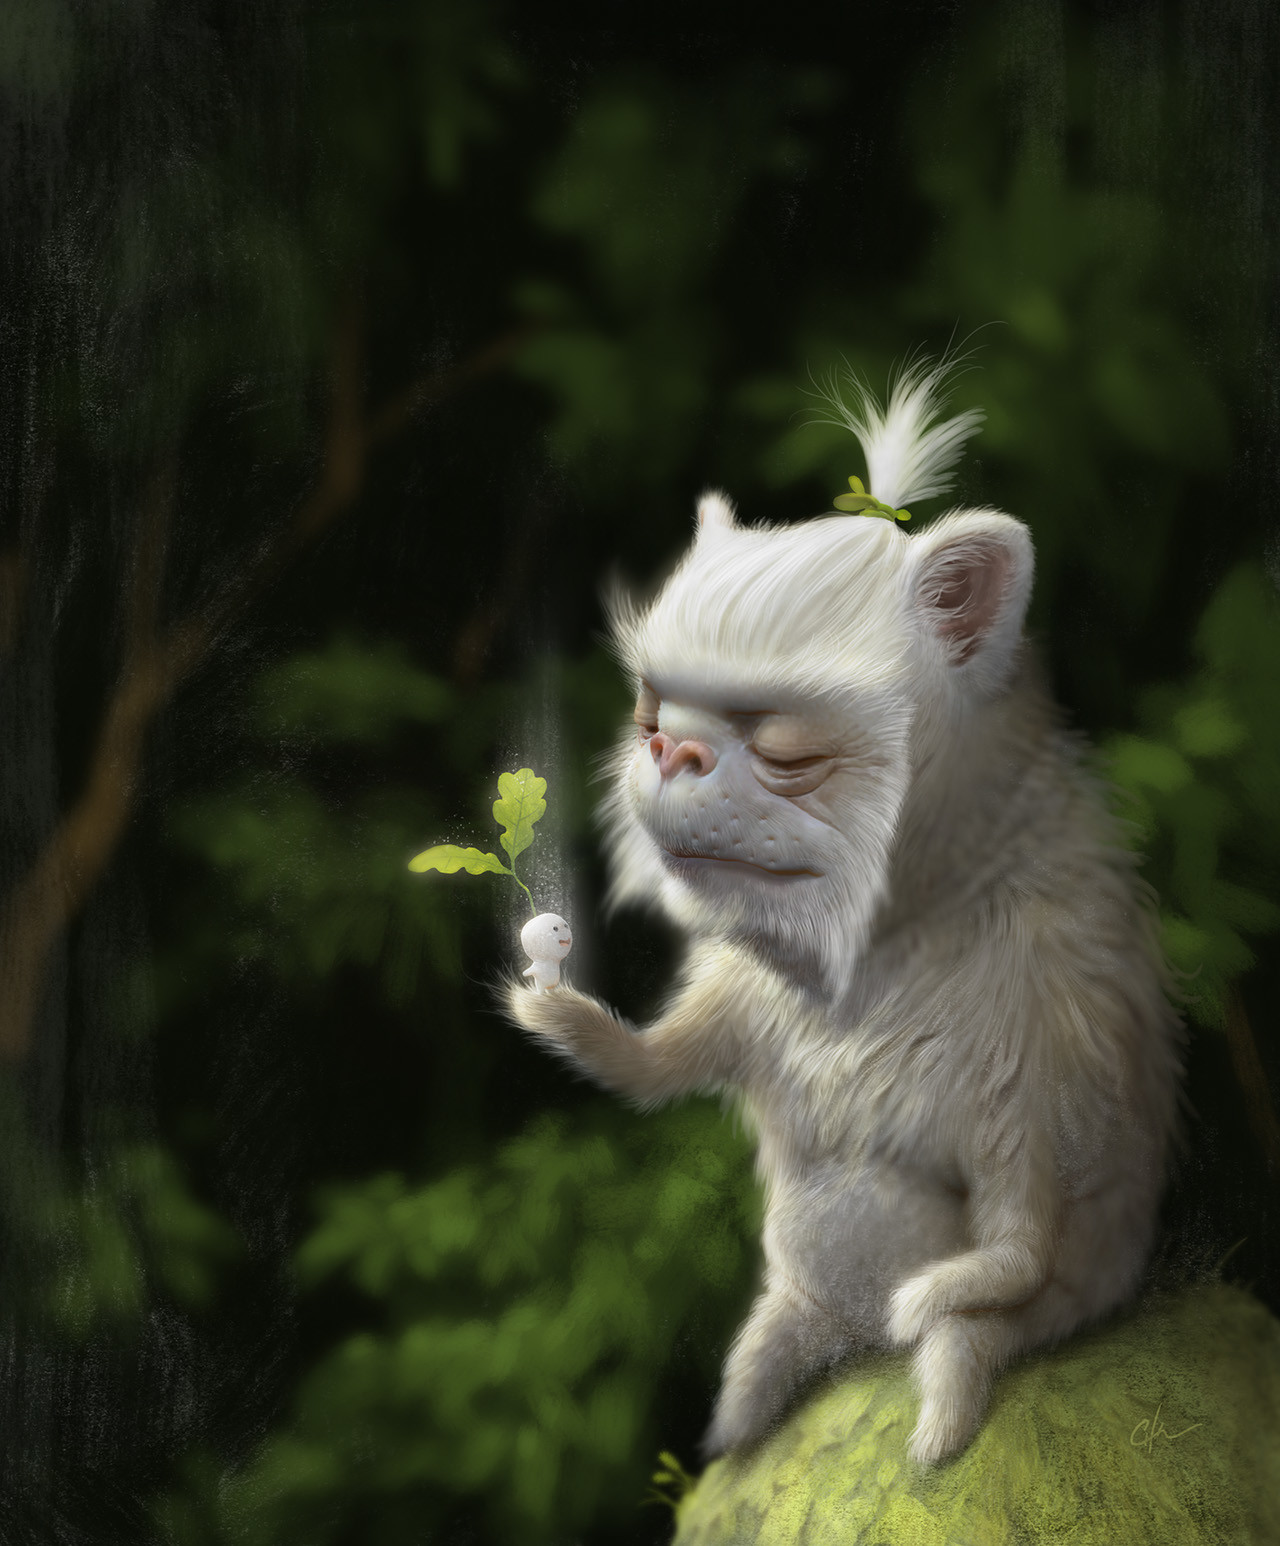 bobby-chiu-spring-is-coming-sm2.jpg